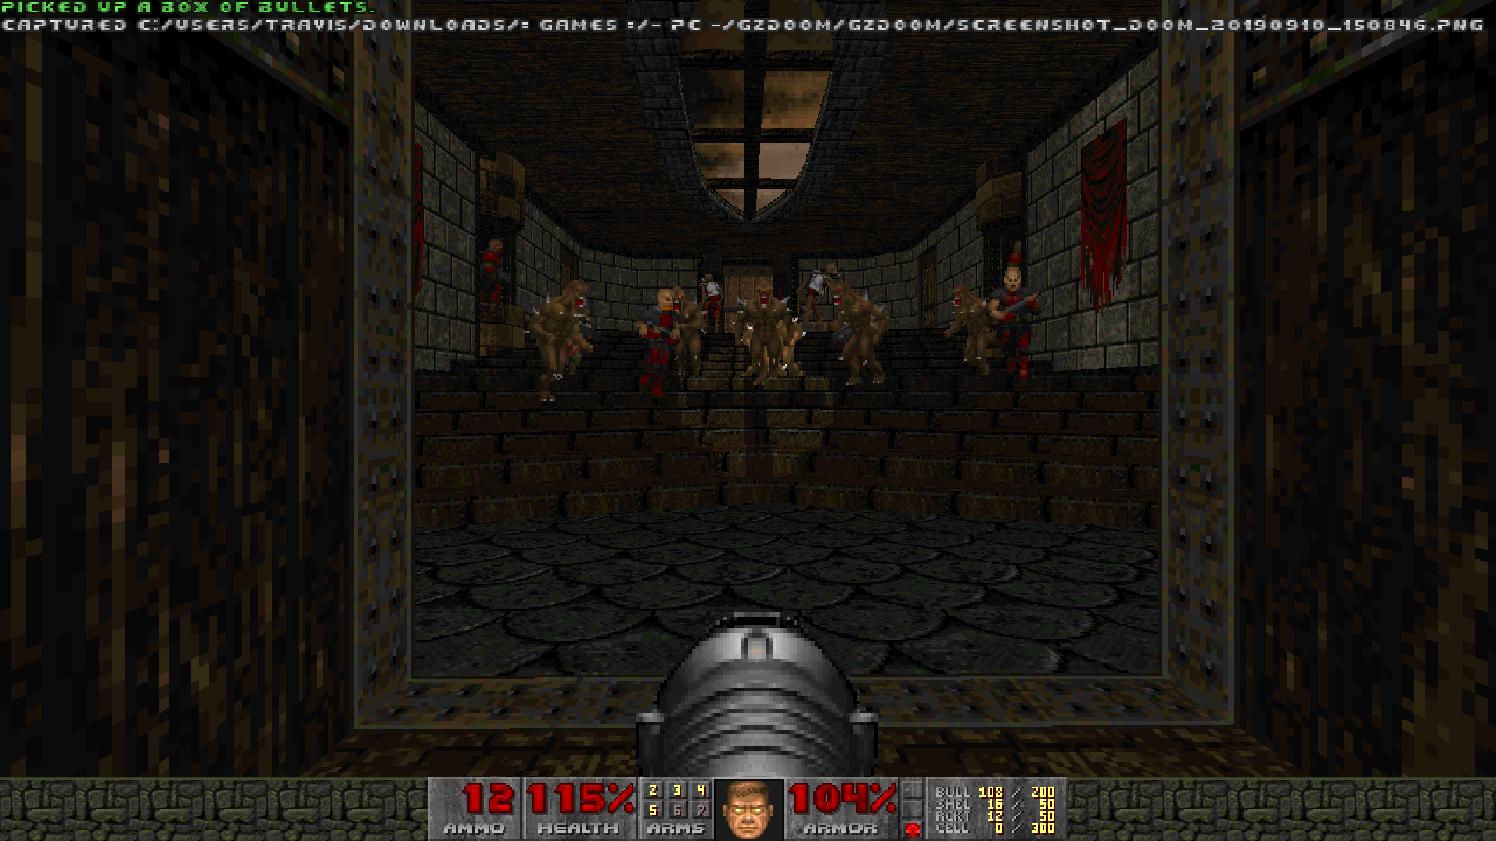 Screenshot_Doom_20190910_150847.png.a5c12f32033eede40bb32d72f1be3d8b.png